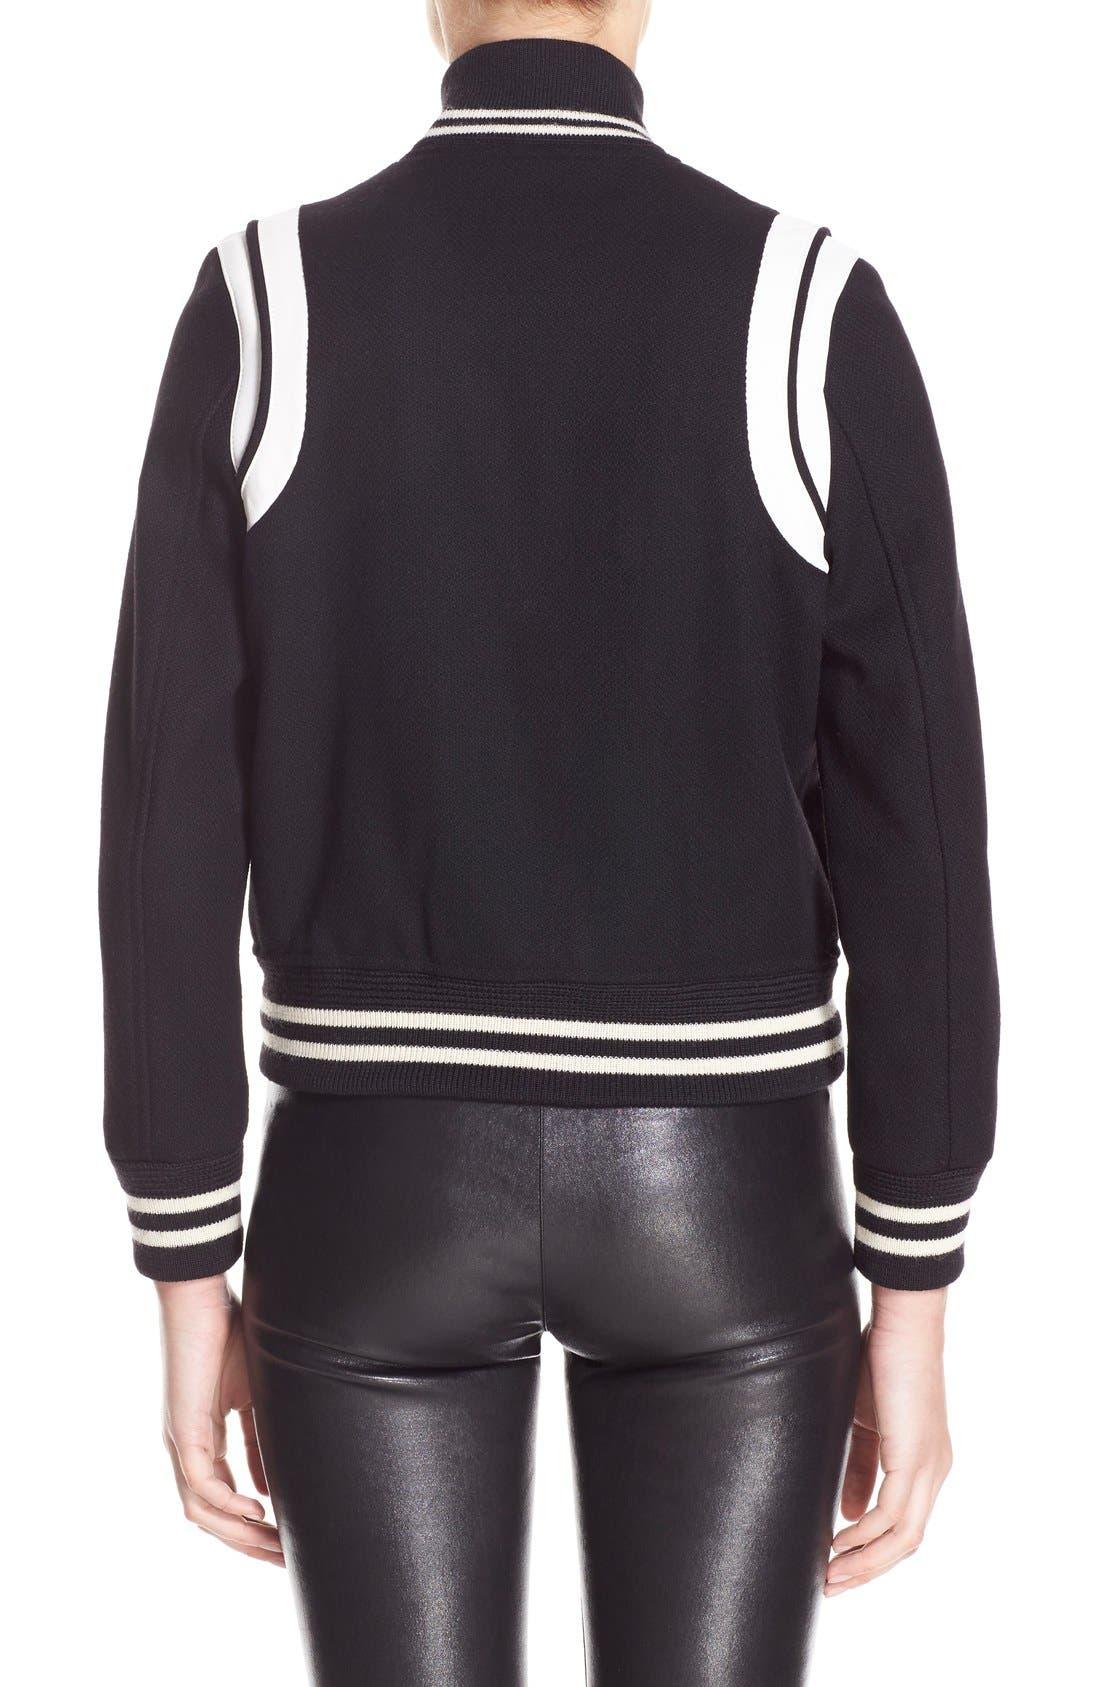 'Teddy' White Leather Trim Bomber Jacket,                             Alternate thumbnail 2, color,                             Black White